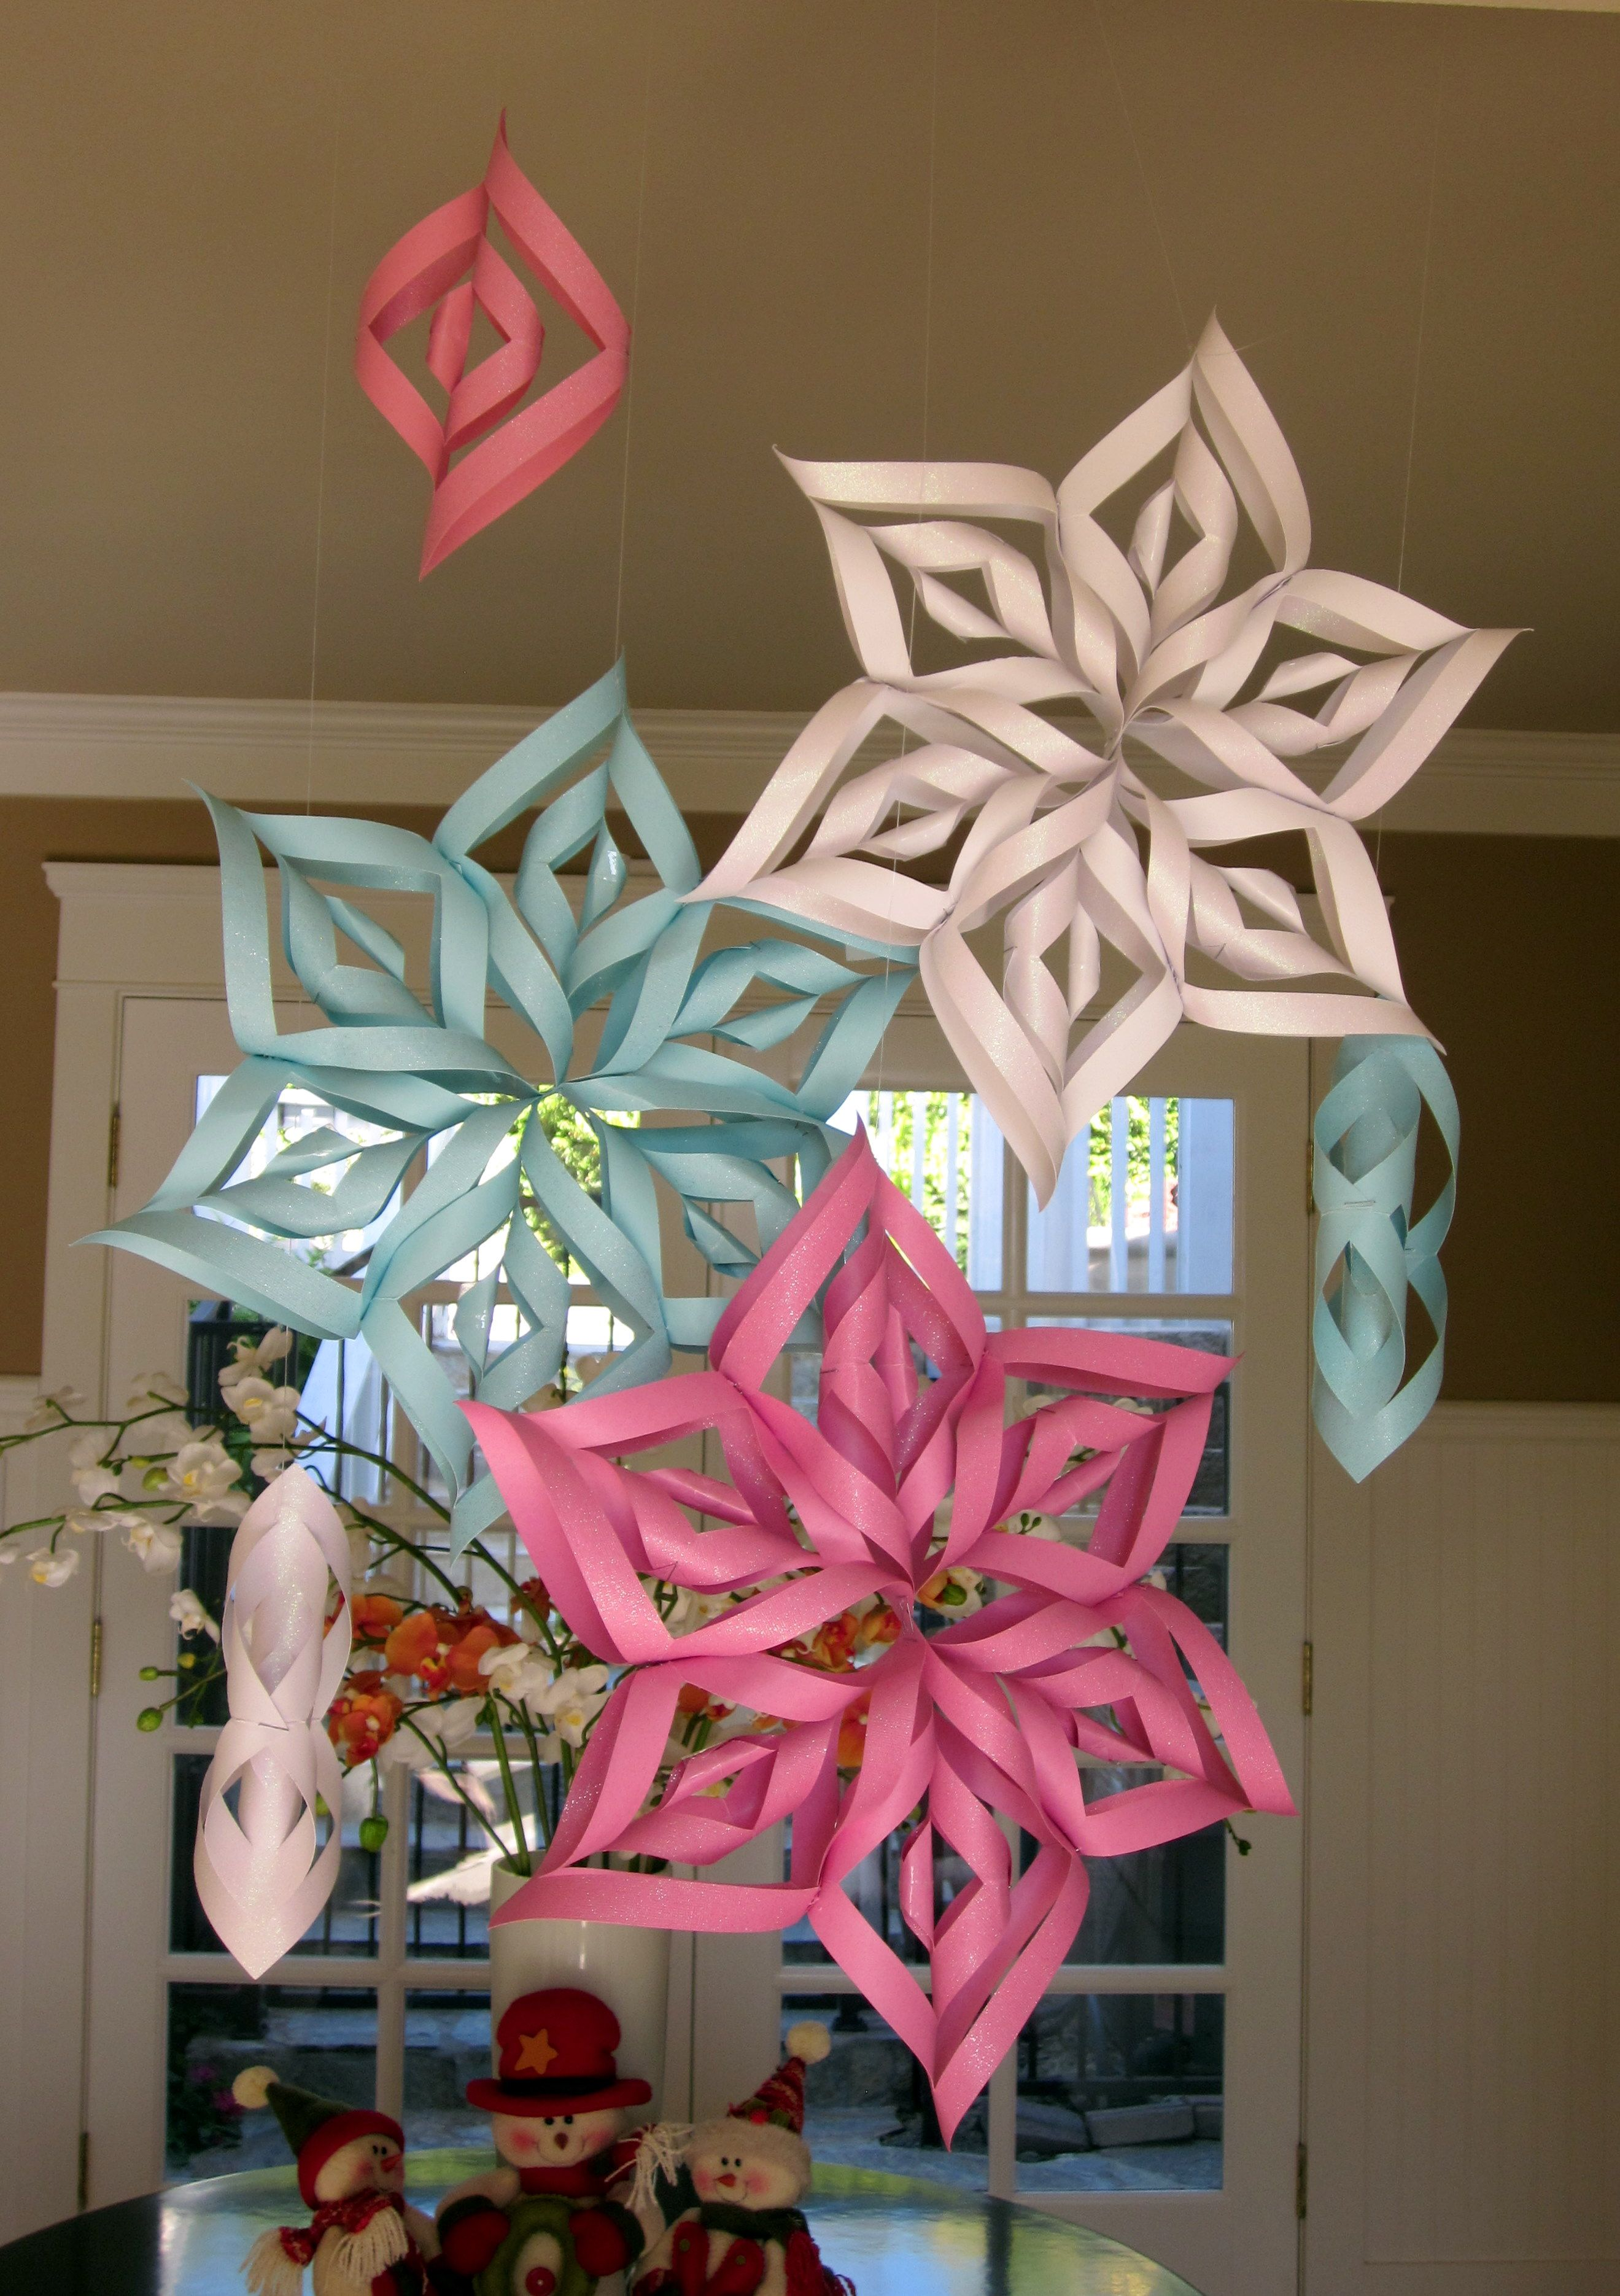 hanging snowflakes 2 639—3 740 pixels